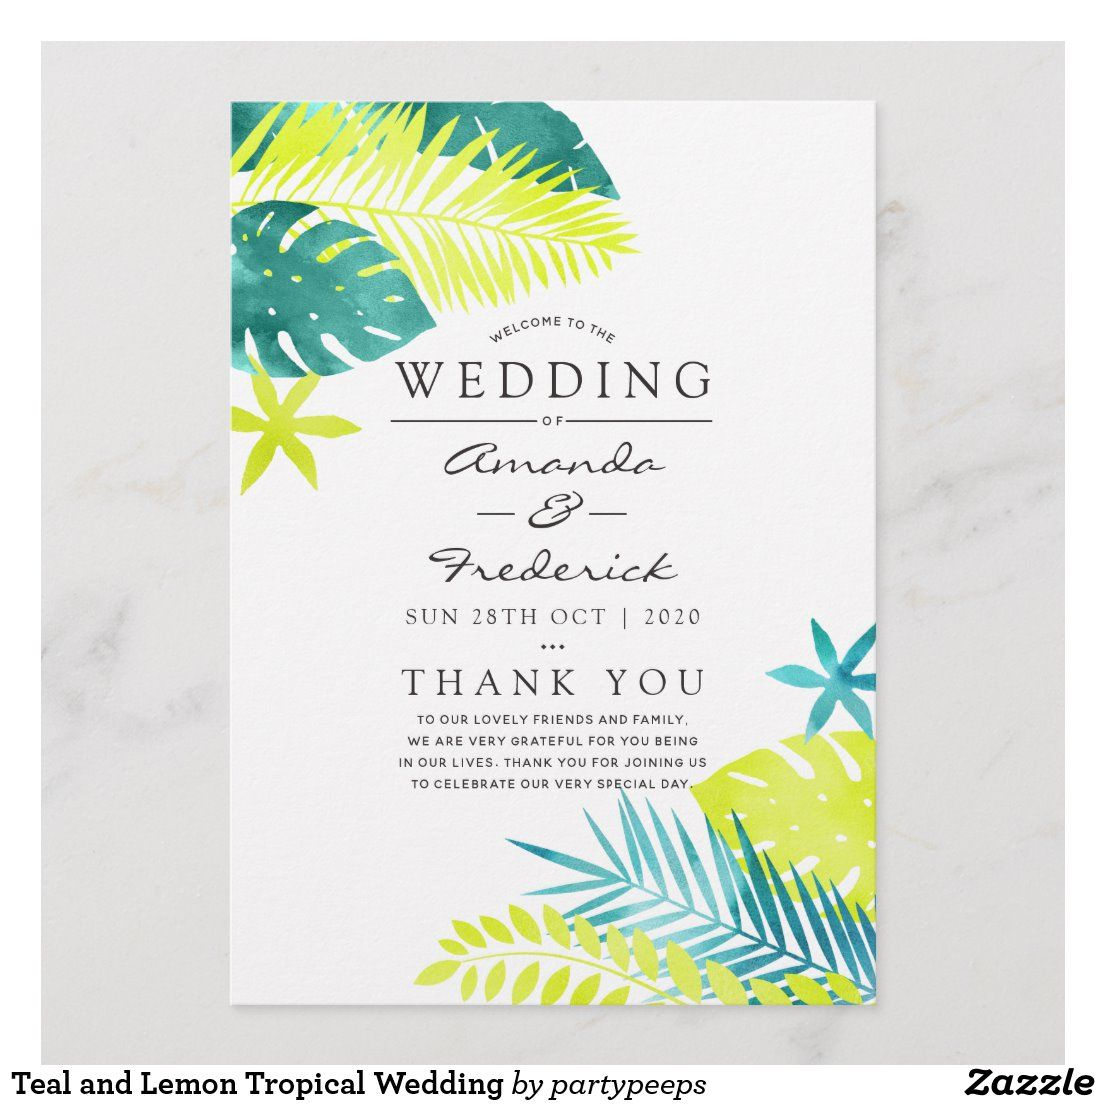 Teal and Lemon Tropical Wedding Program in